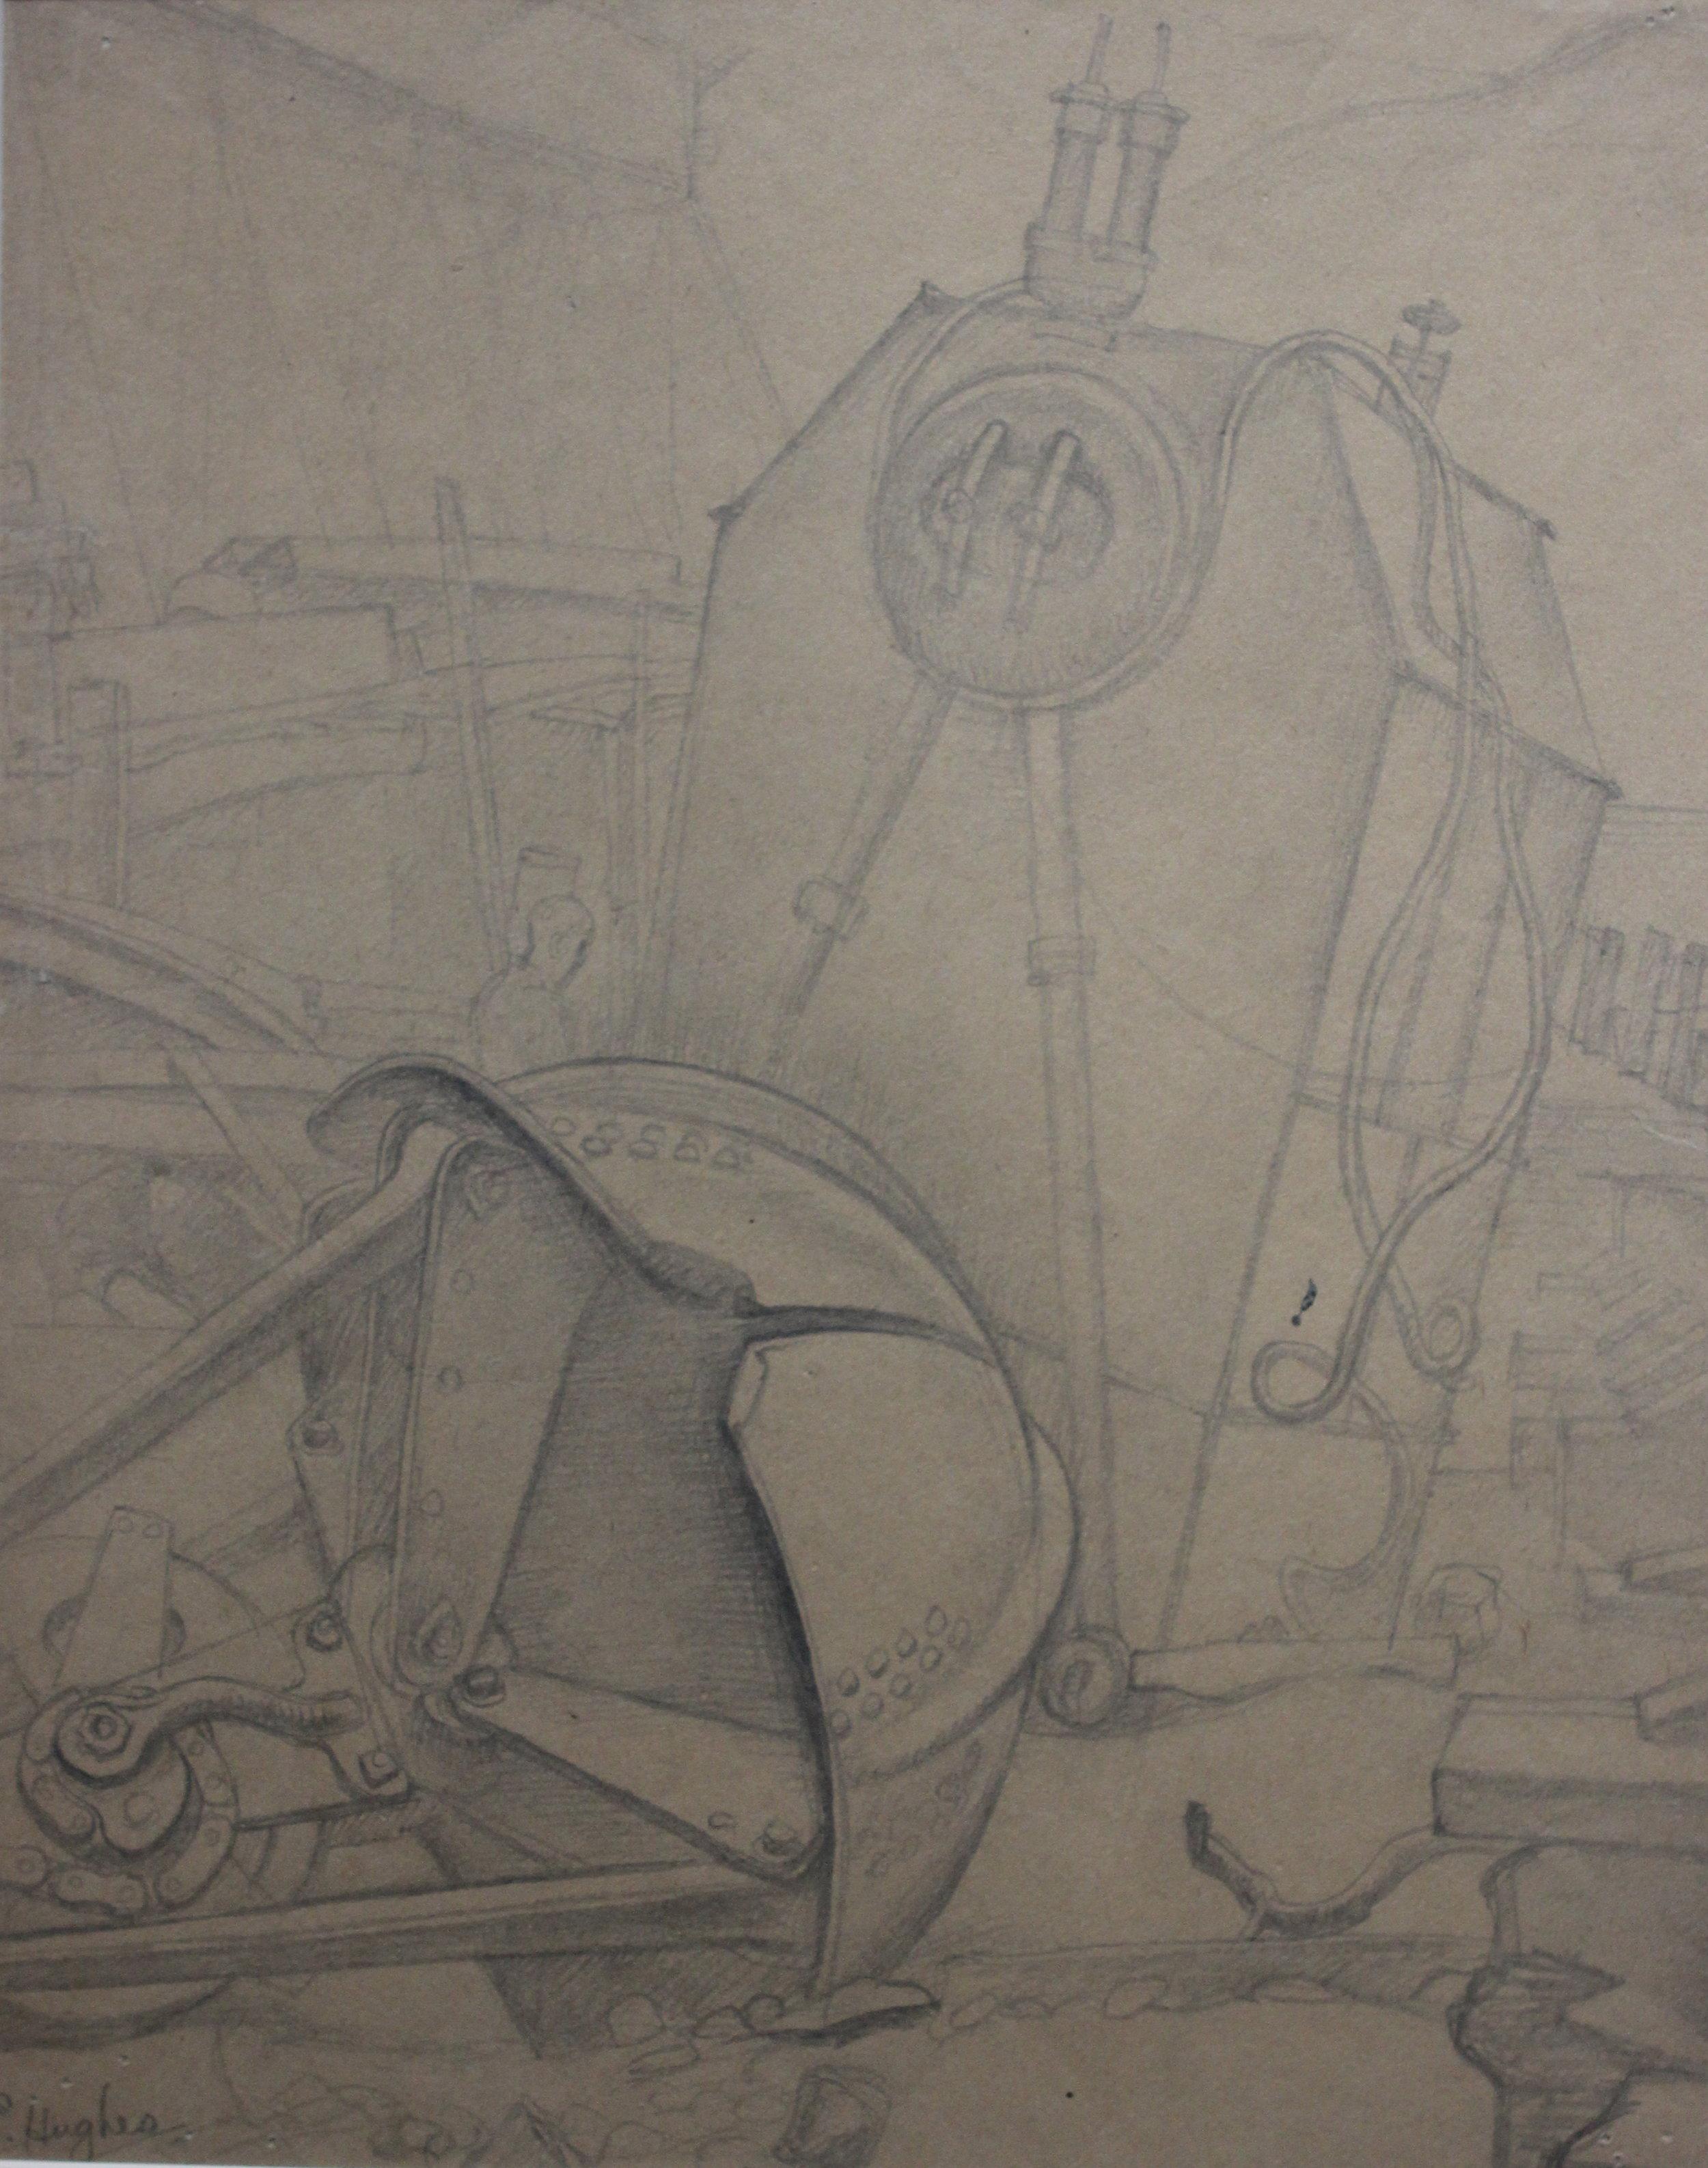 E.J Hughes, Machinery